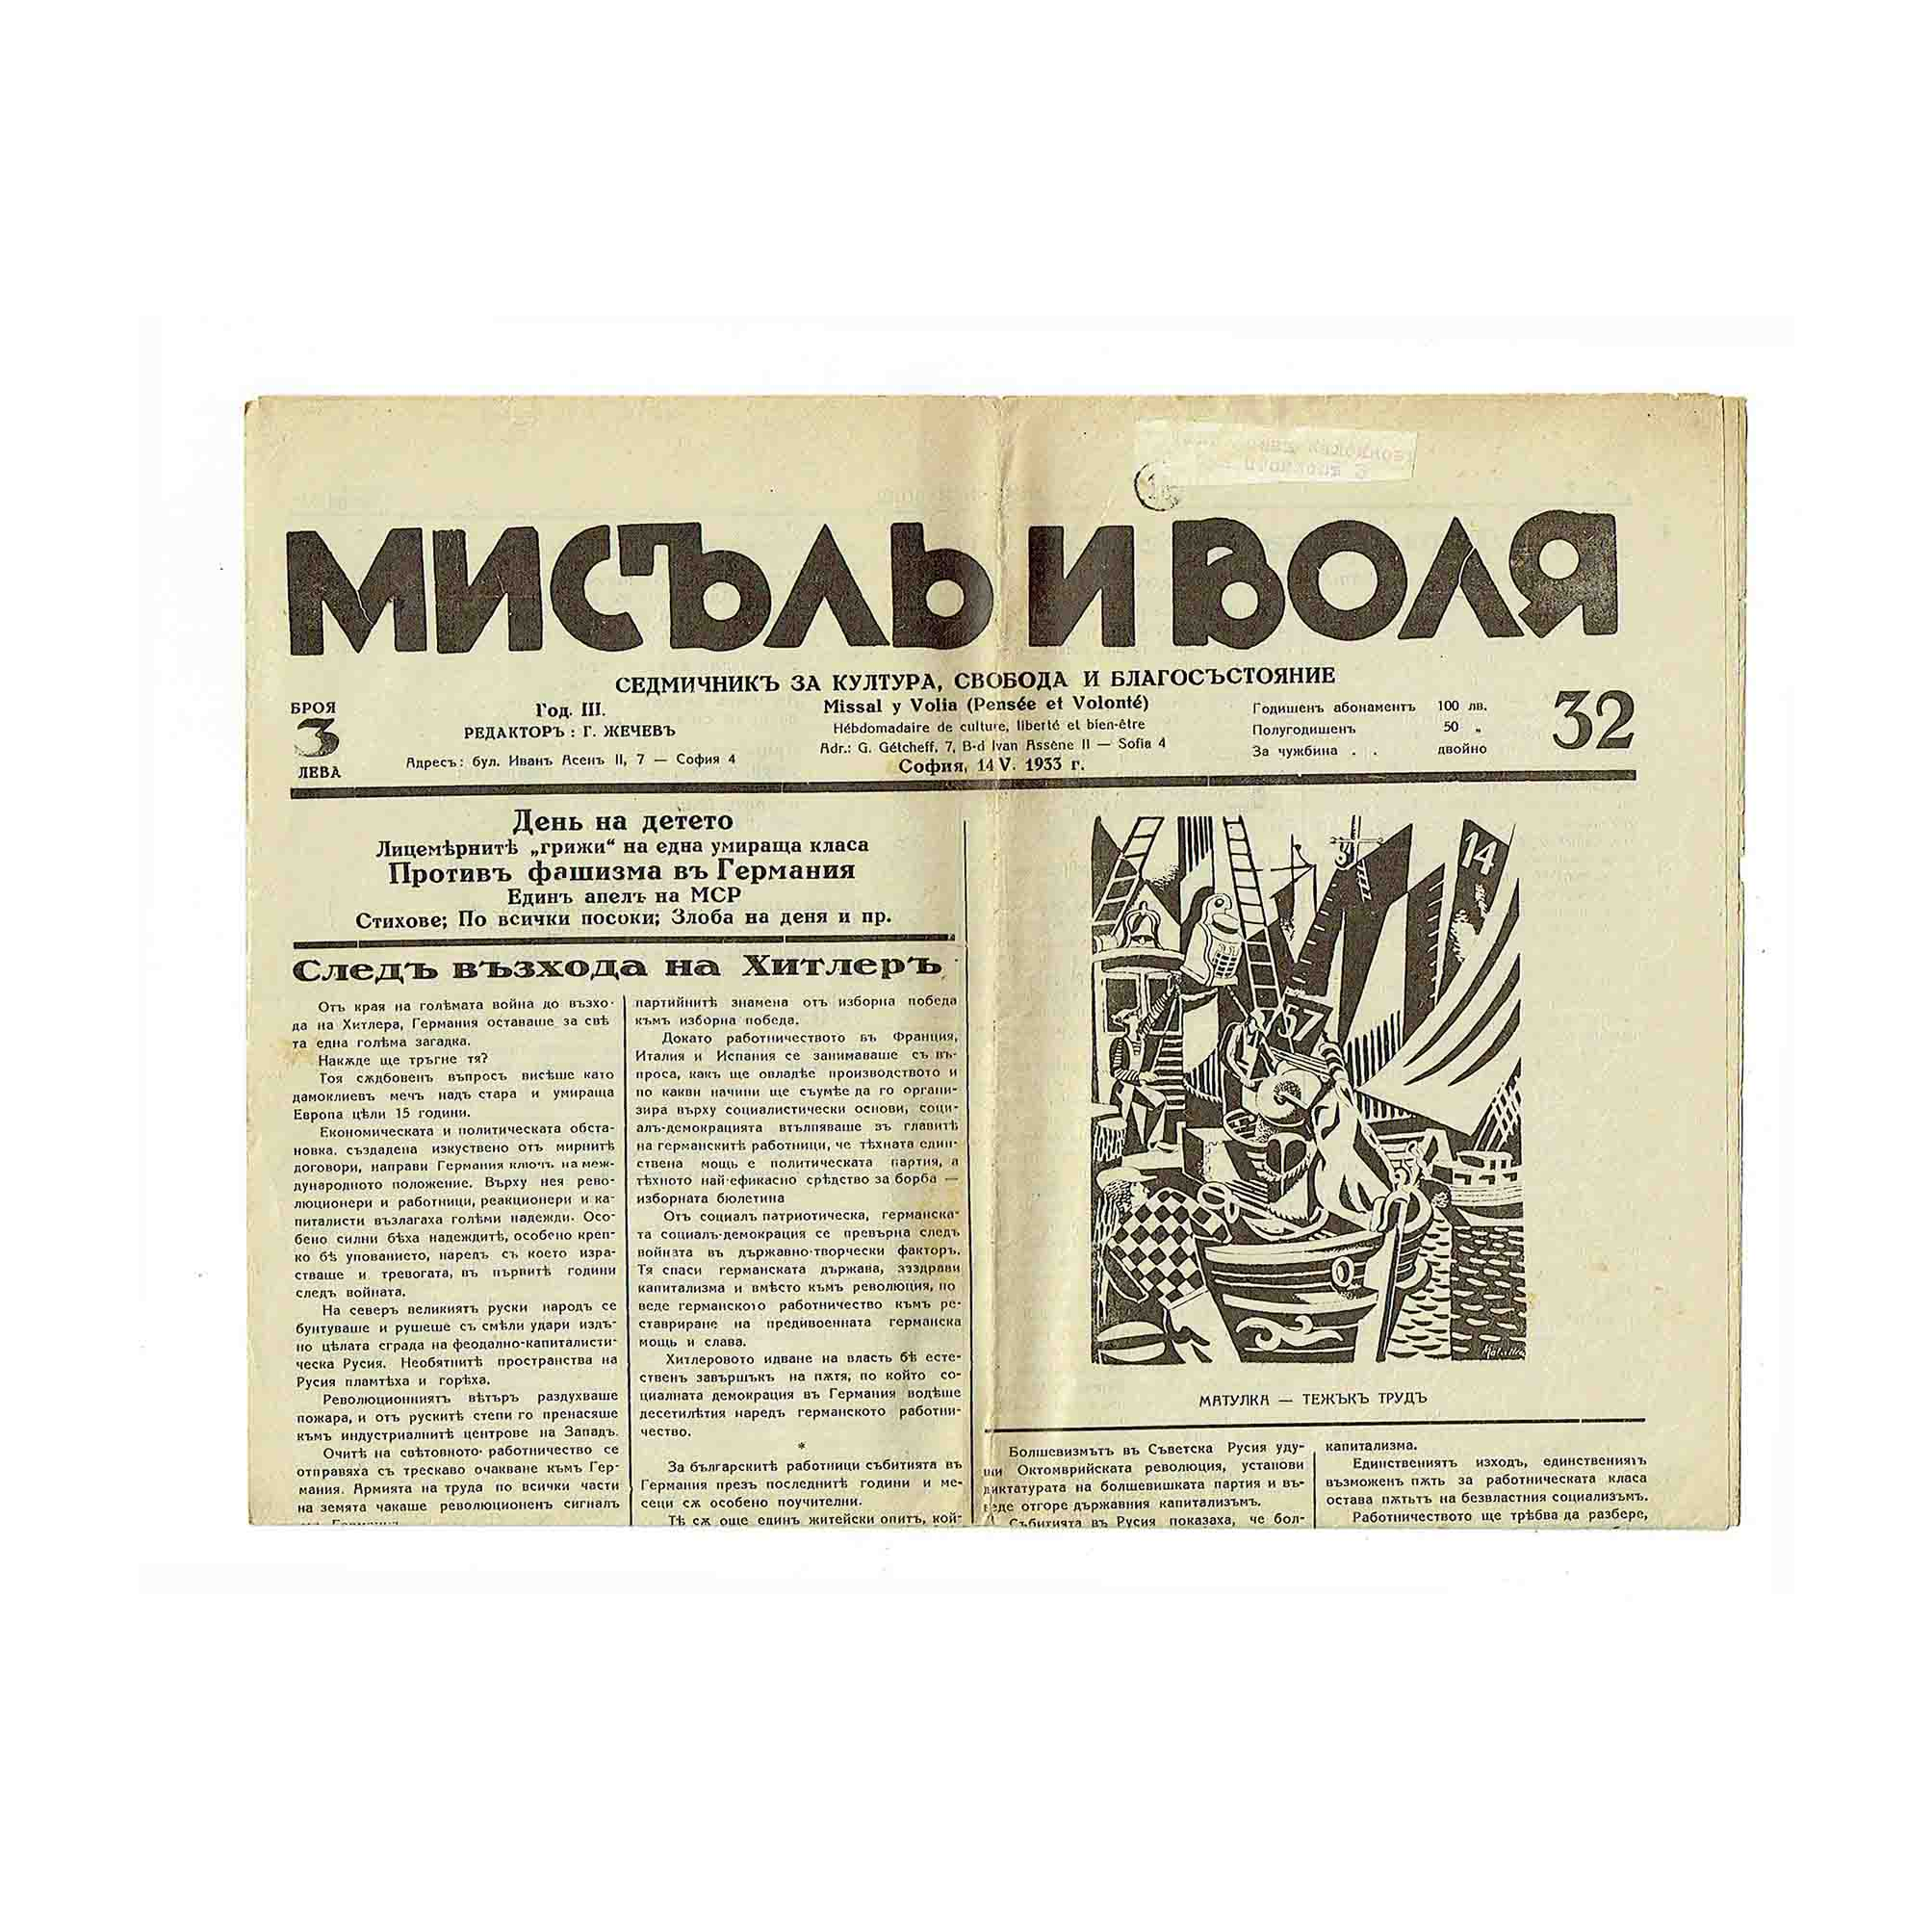 5851-Misal-i-Volya-Gedanke-und-Wille-III-35-1933-Jan-Matulka-Titelblatt-frei-N.jpeg